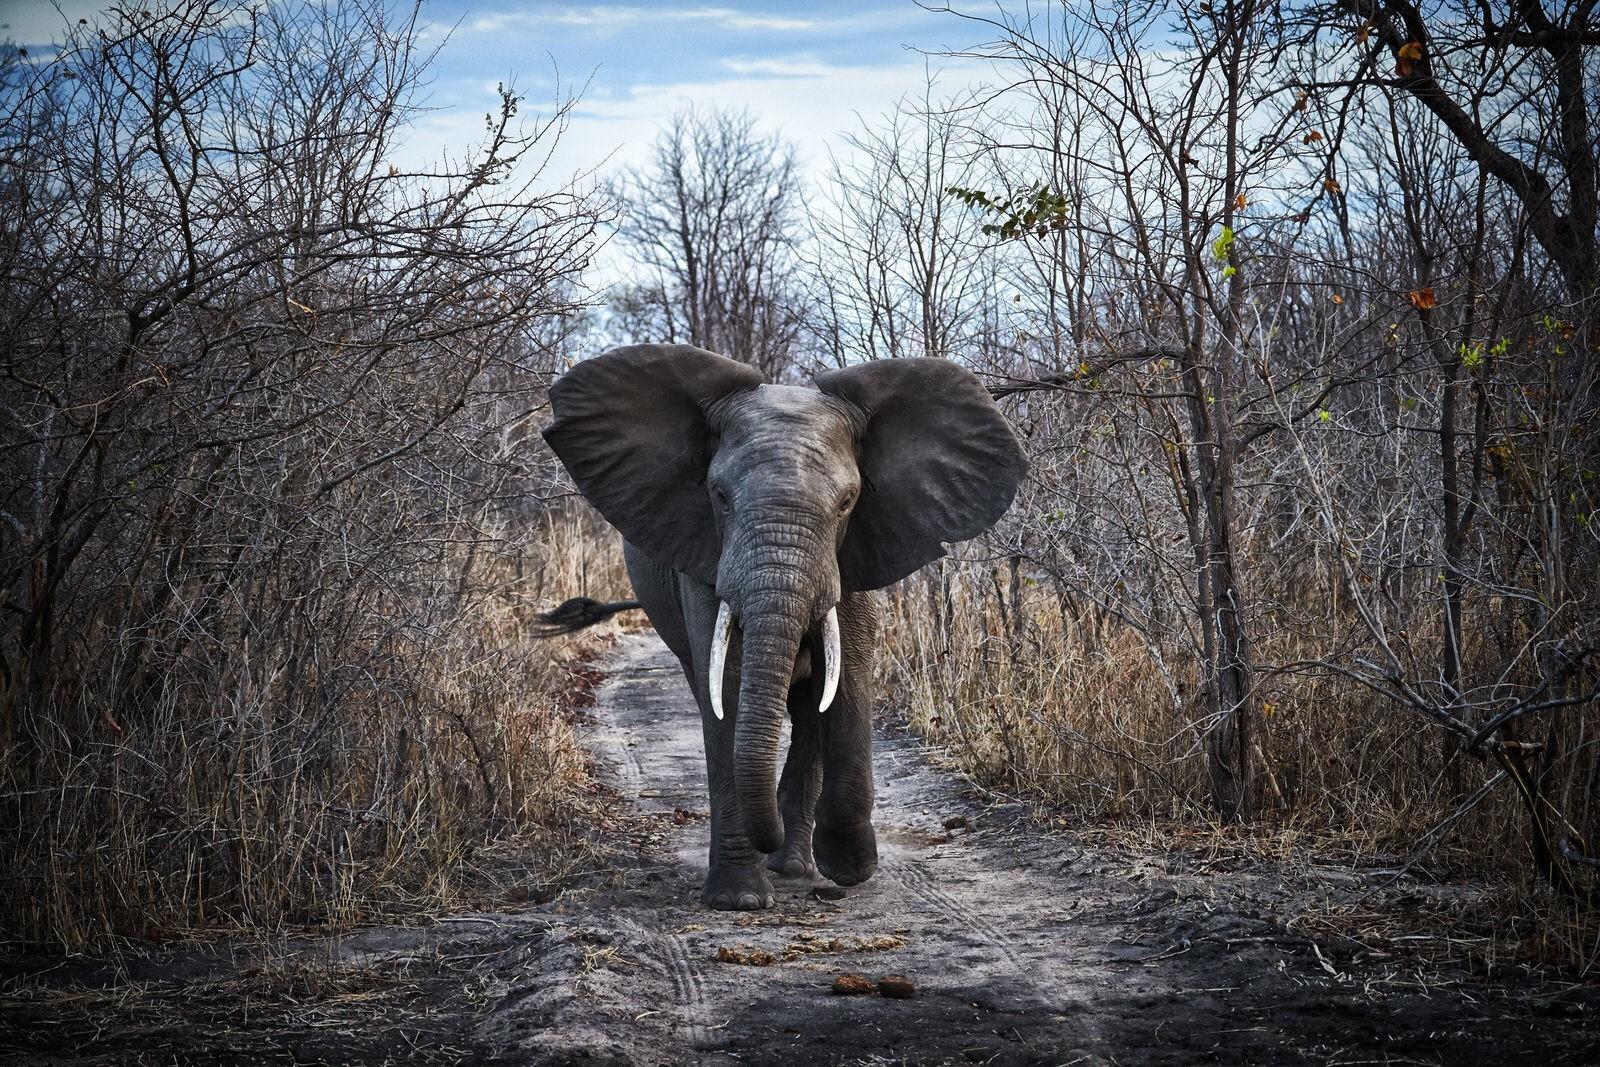 Malawi's wildlife renaissance